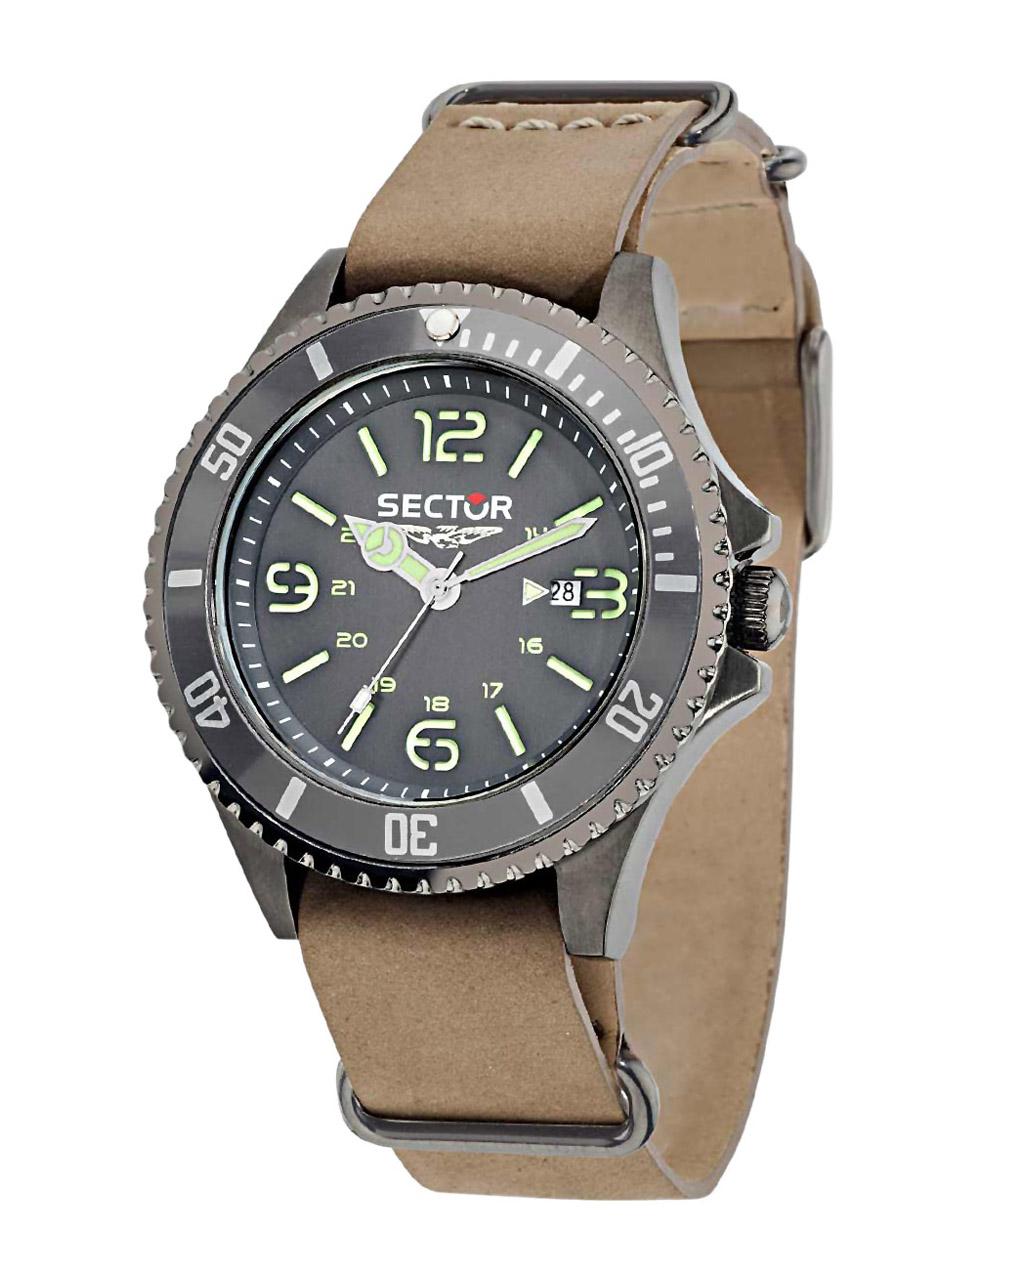 SECTOR Ρολόι R3251161010   προσφορεσ ρολόγια